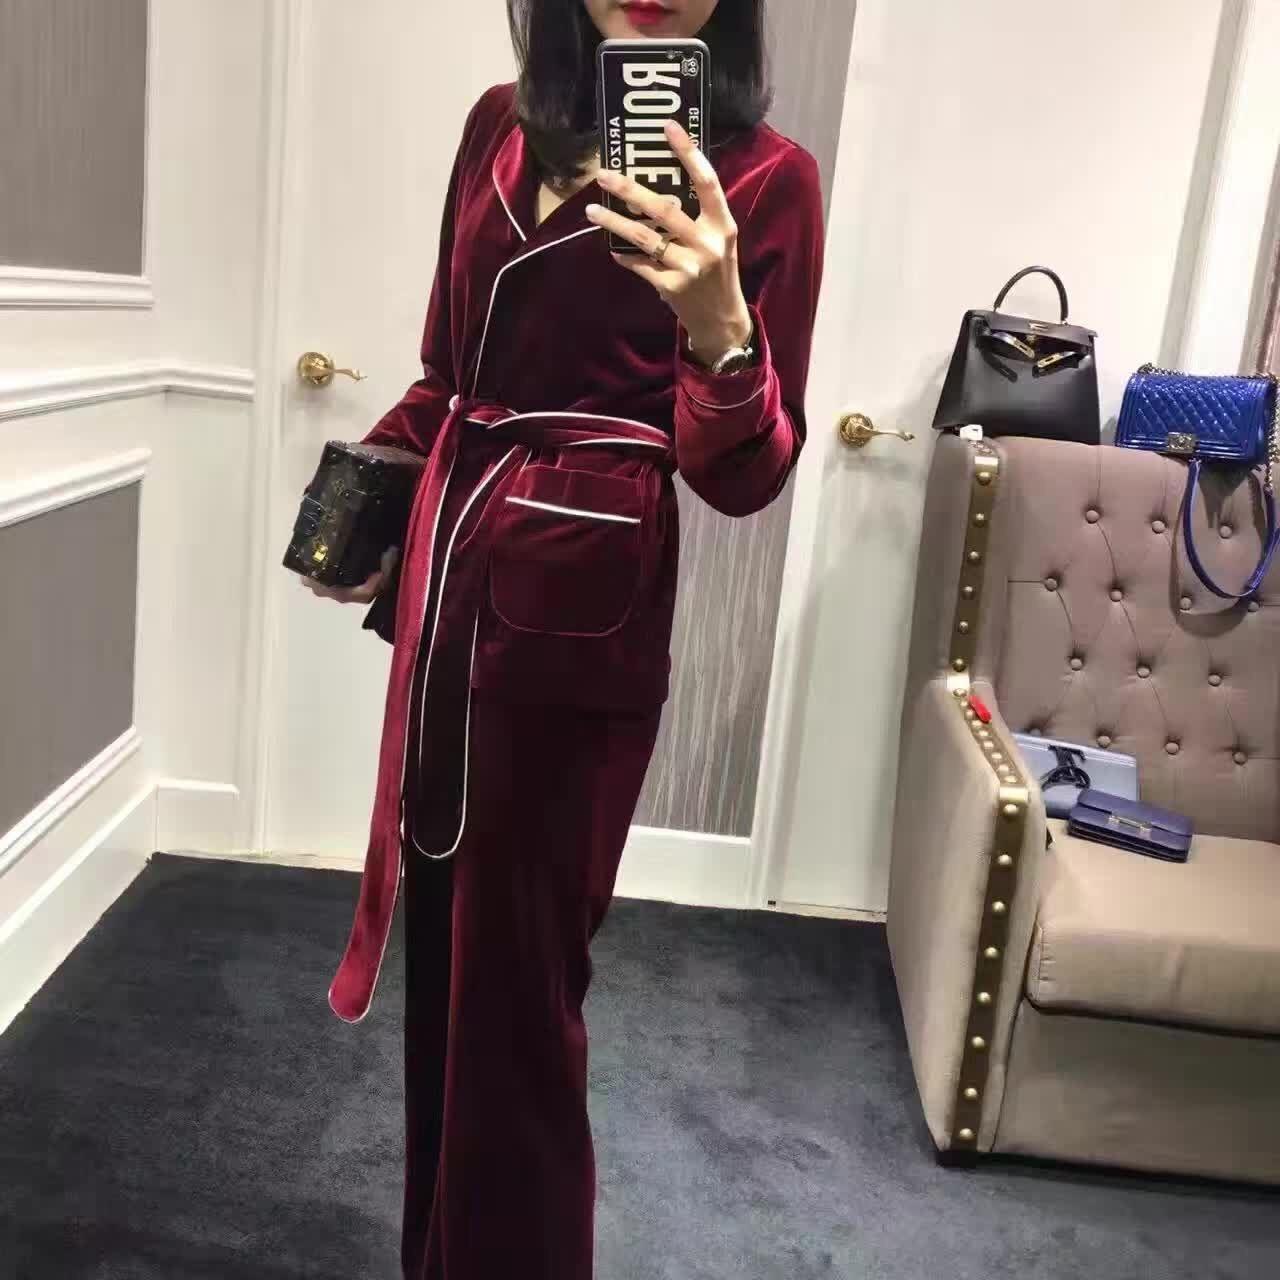 197c804d10 2019 New Autumn Designer Fashion Women Bathrobe Style Stunning Velvet Women  Blazer Tops + Pants Suit Black Red Two Piece Set From Cinda02